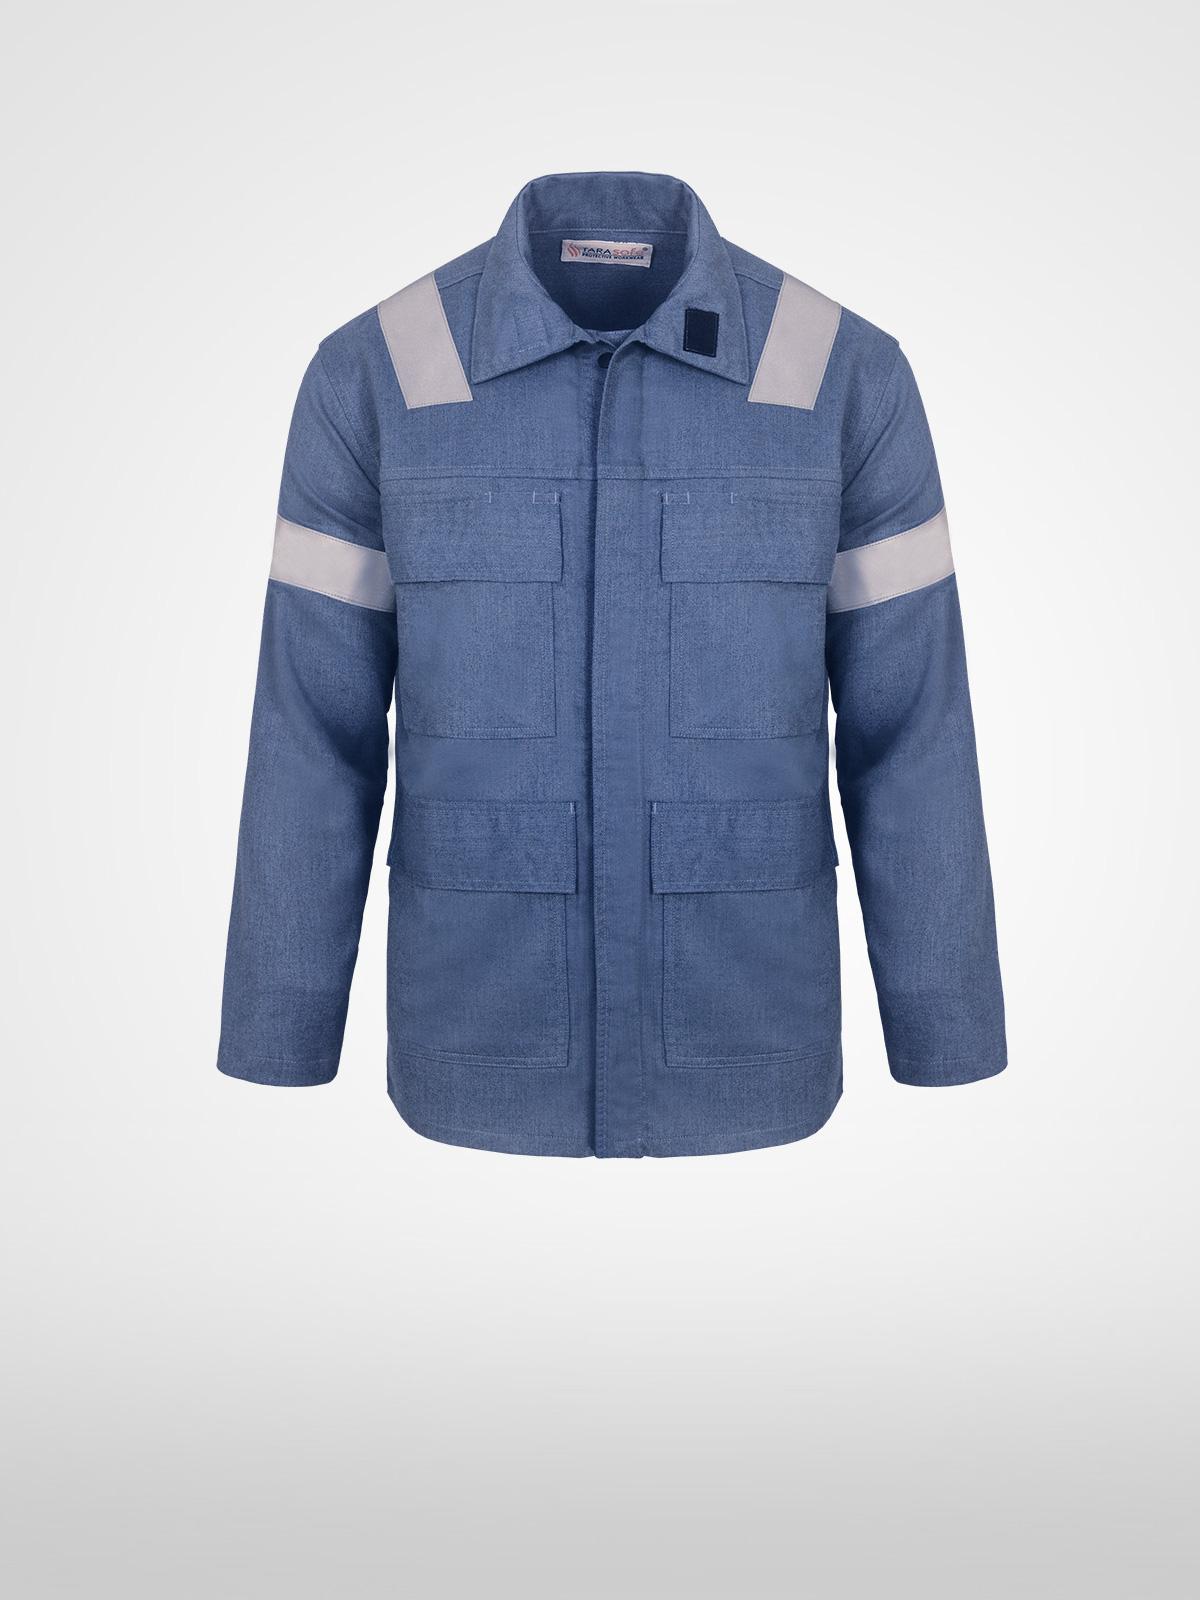 75132e90066 FR Shirts - Manufacturer   Supplier of Flame Resistant Shirts